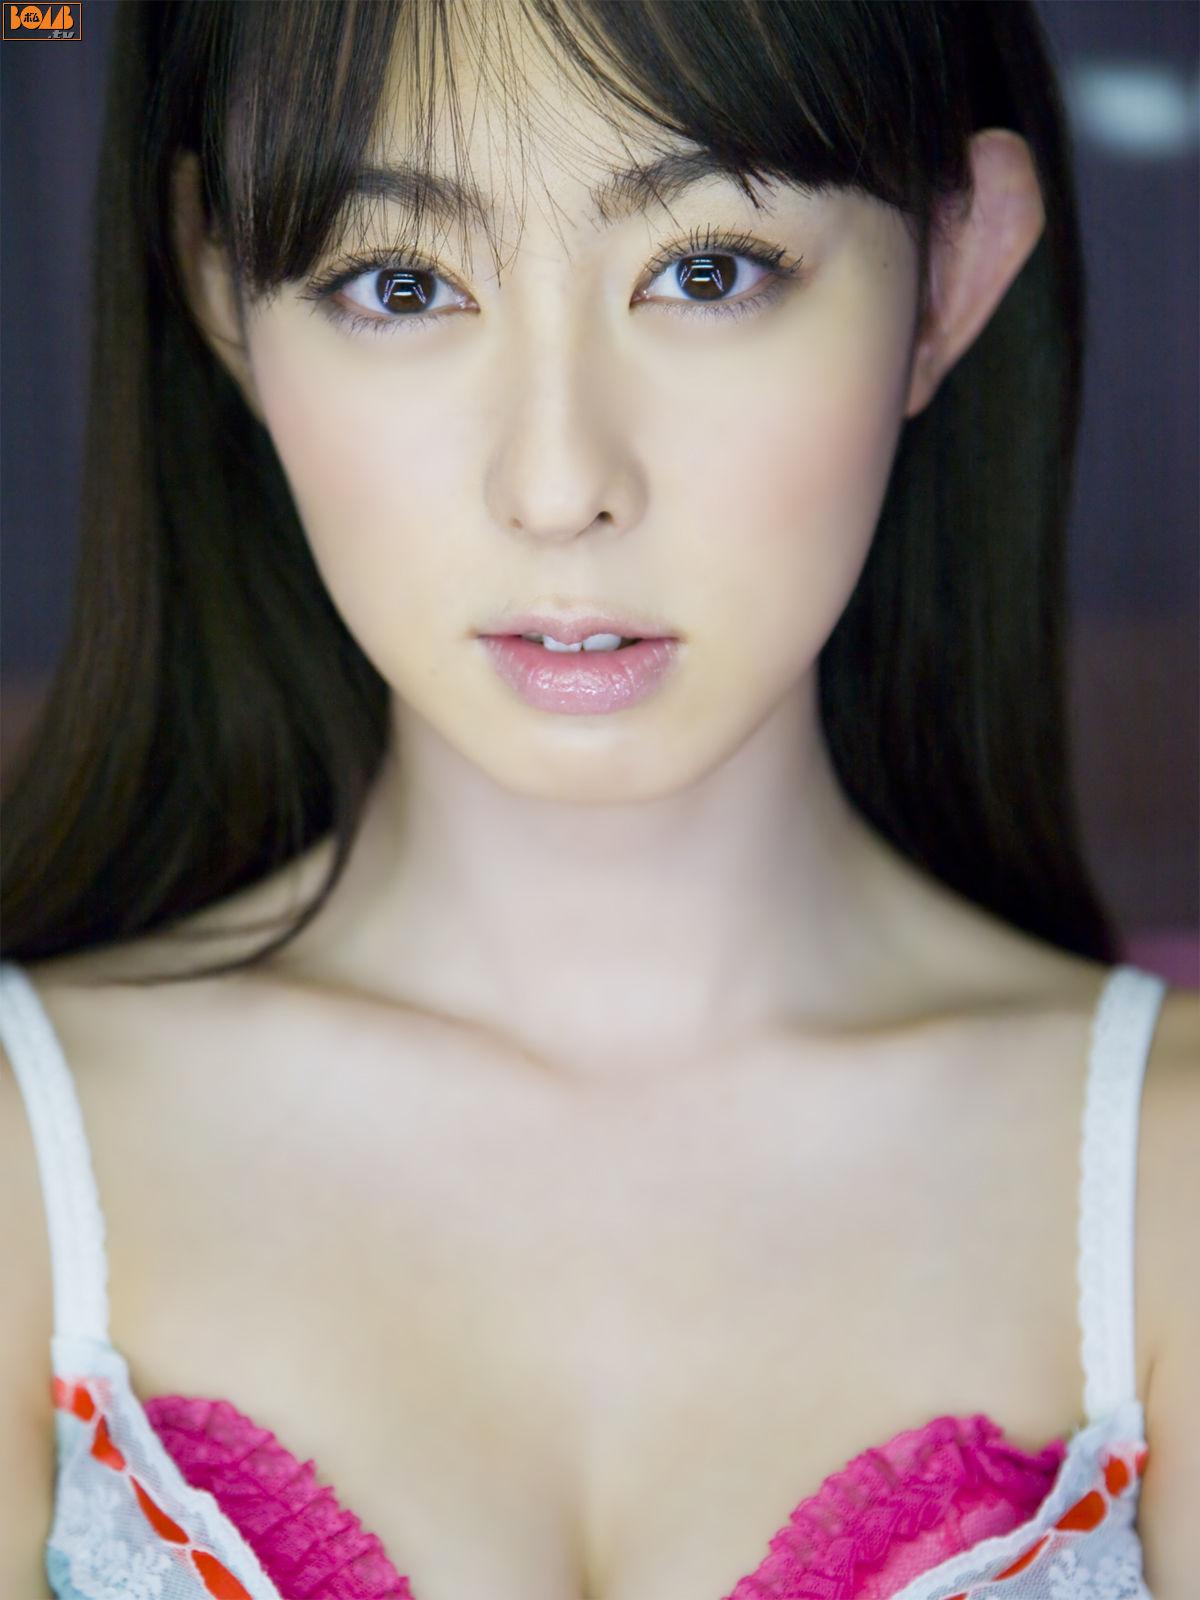 秋山莉奈 Rina Akiyama 2009-04